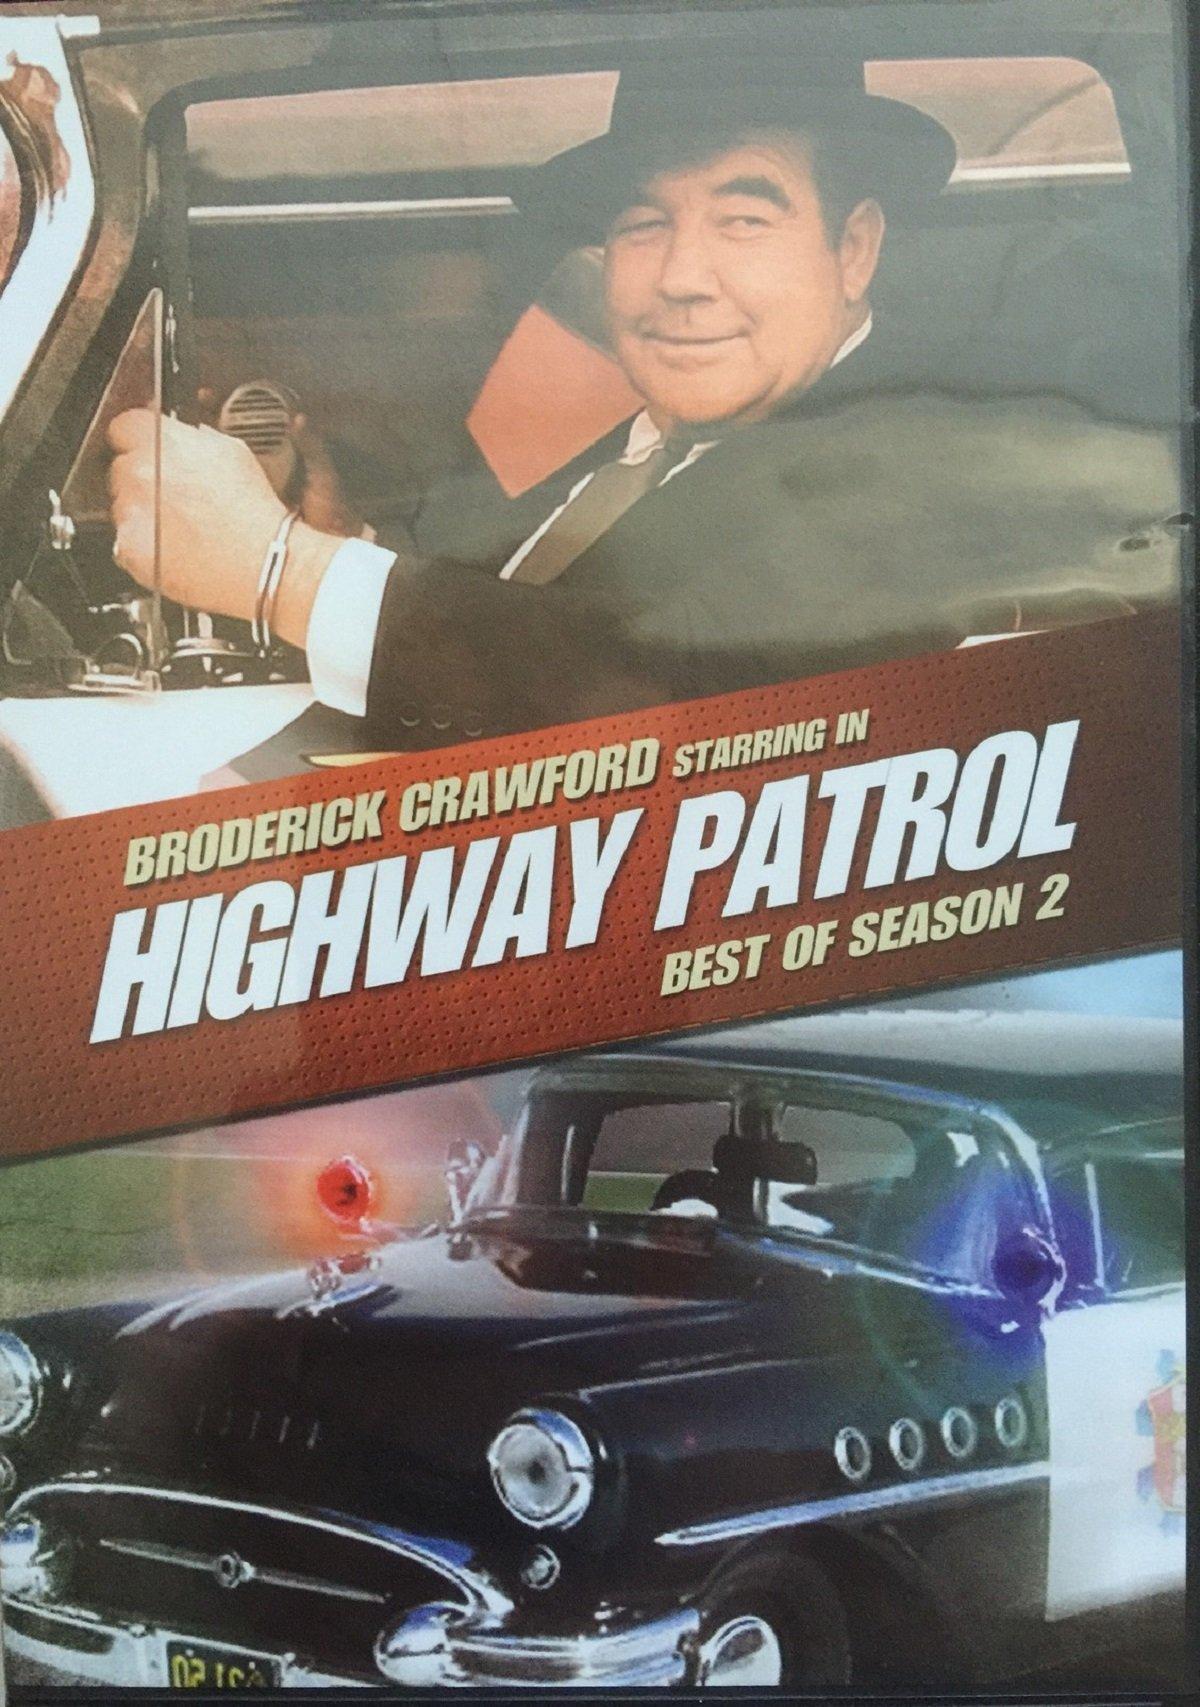 Highway Patrol Best of Season 2 Dvd by United Artists / MGM